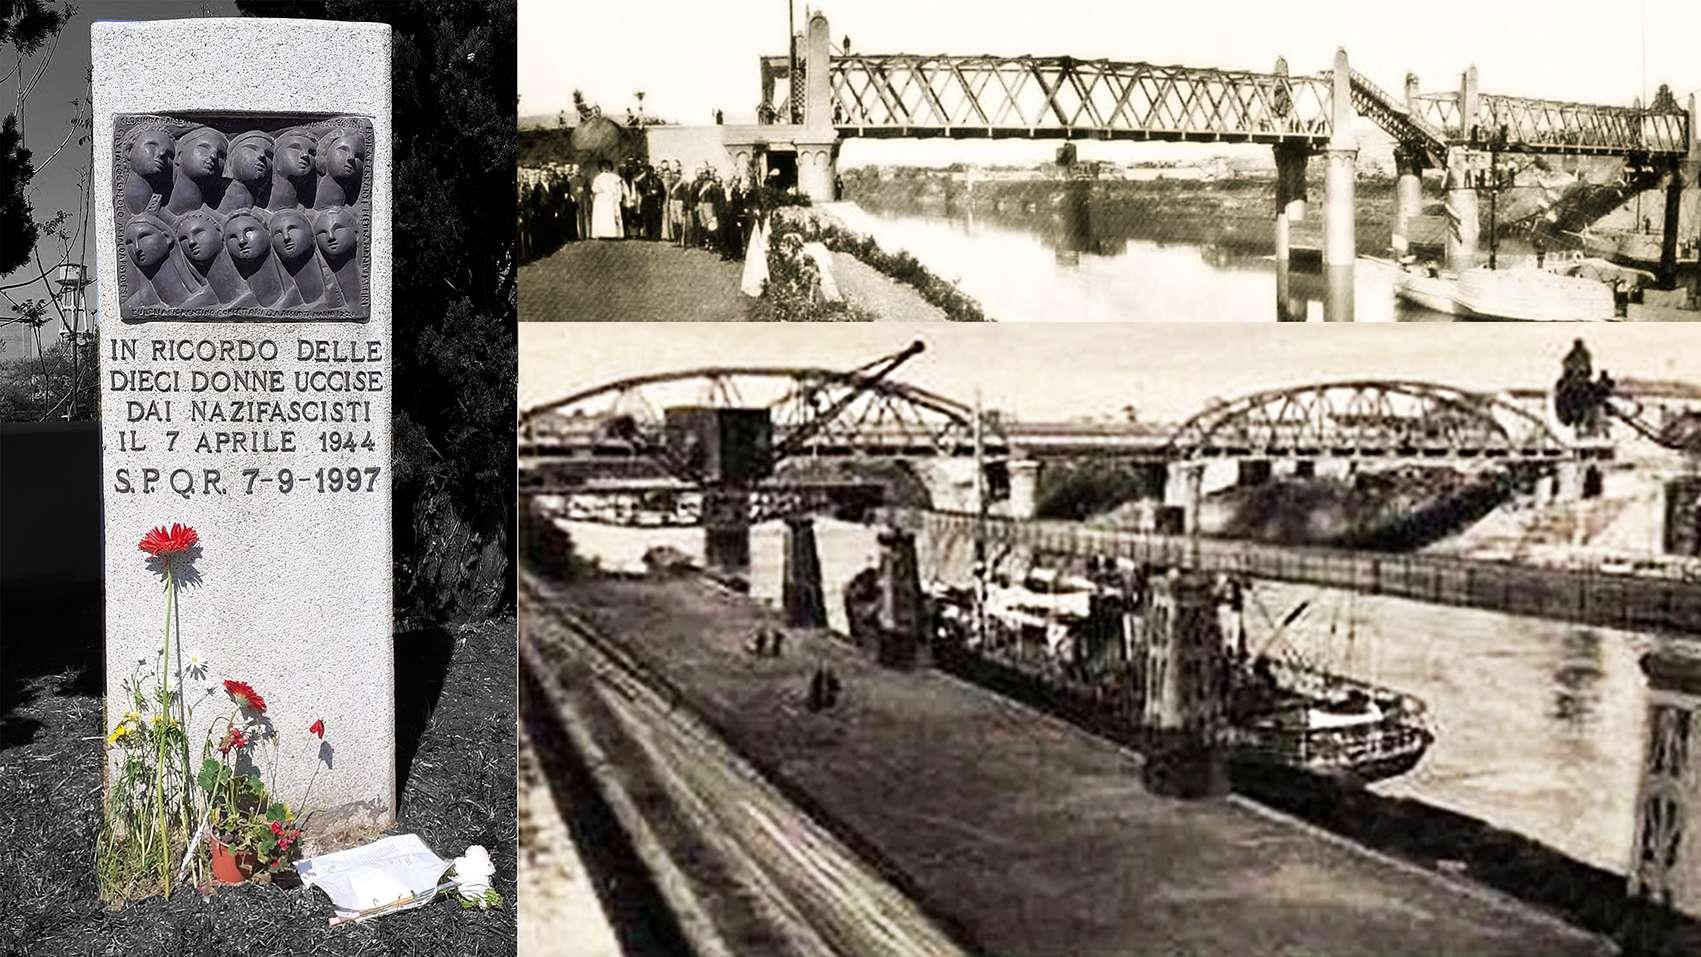 Ponte di Ferro Σιδερένια Γέφυρα Ρώμης μια «άγνωστη» ιστορία από την αντίσταση